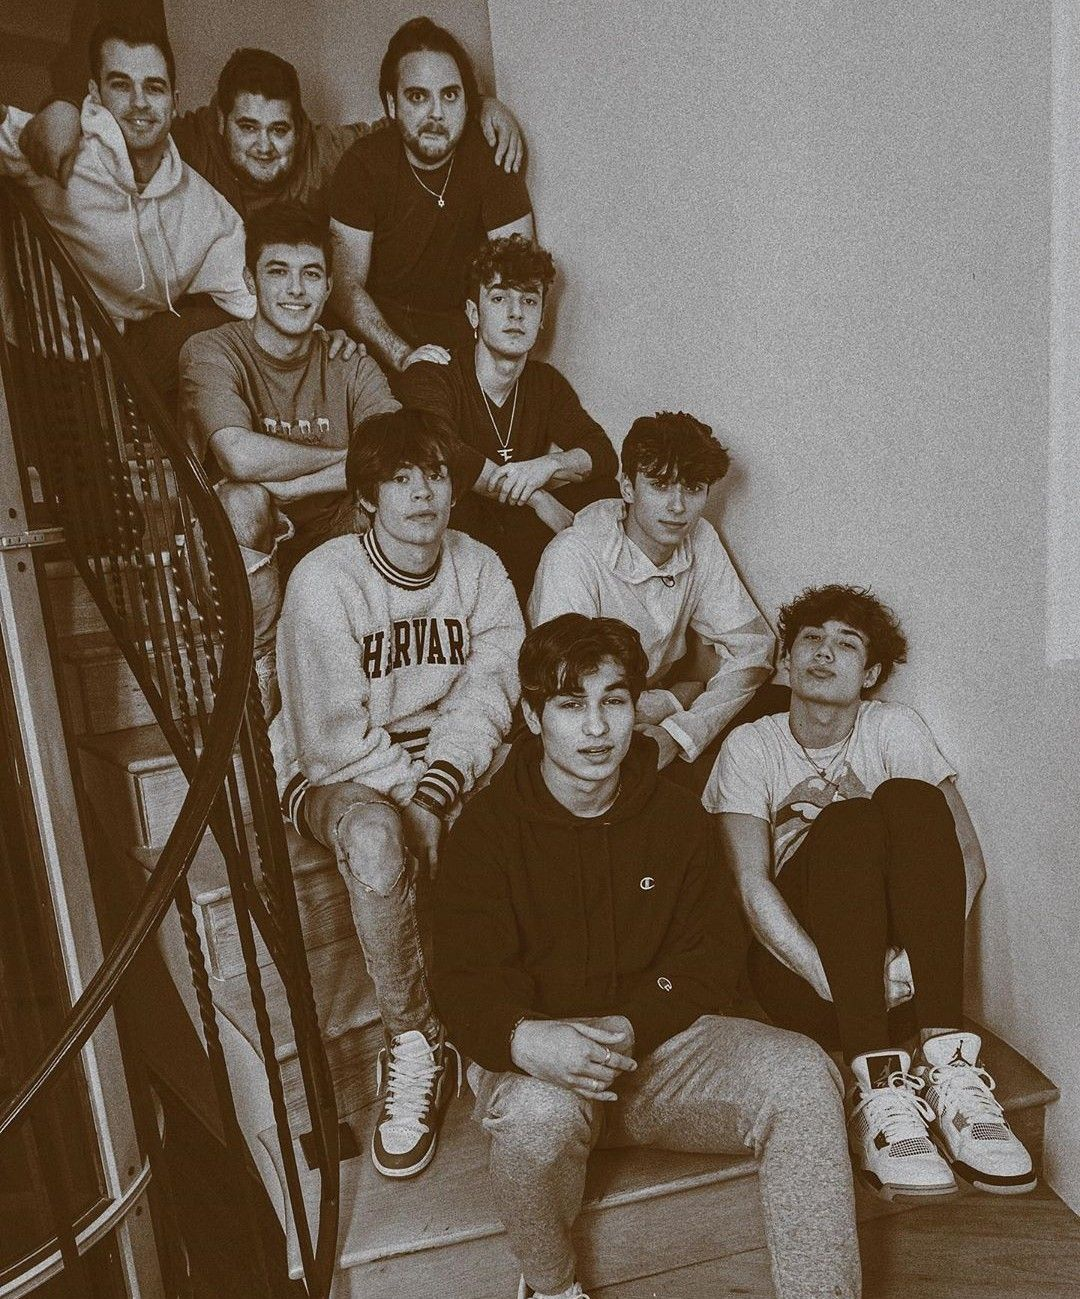 Pin By Ivy Twisty On Boys In 2020 Young Cute Boys Cute Boys